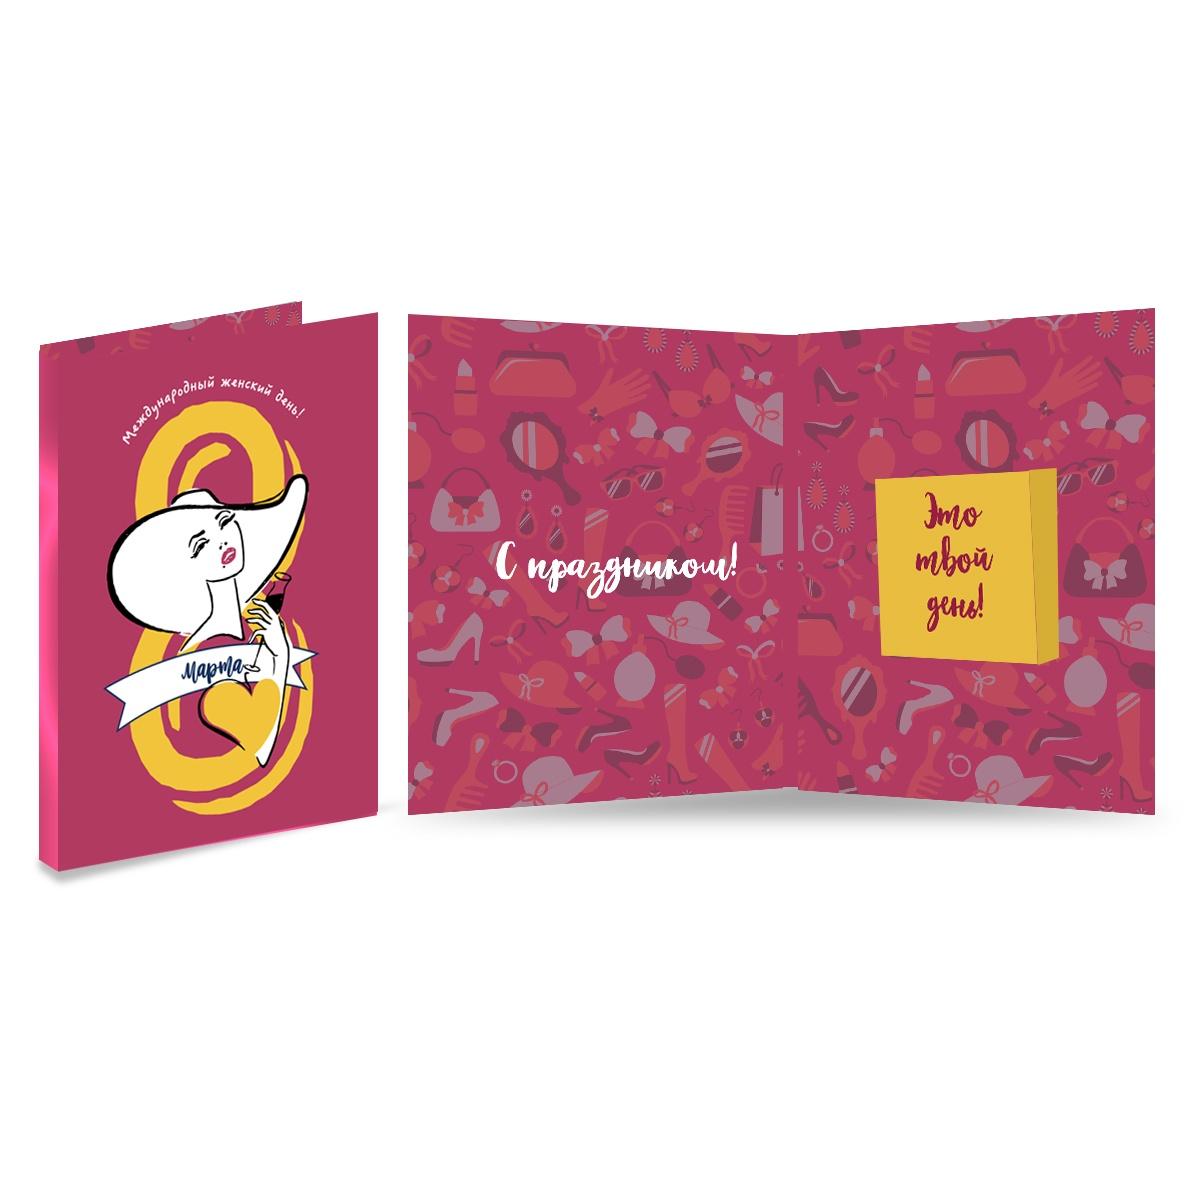 Мини-открытка с шоколадом DolcePic «С 8 марта», 5 г открытка printio открытка к 8 марта